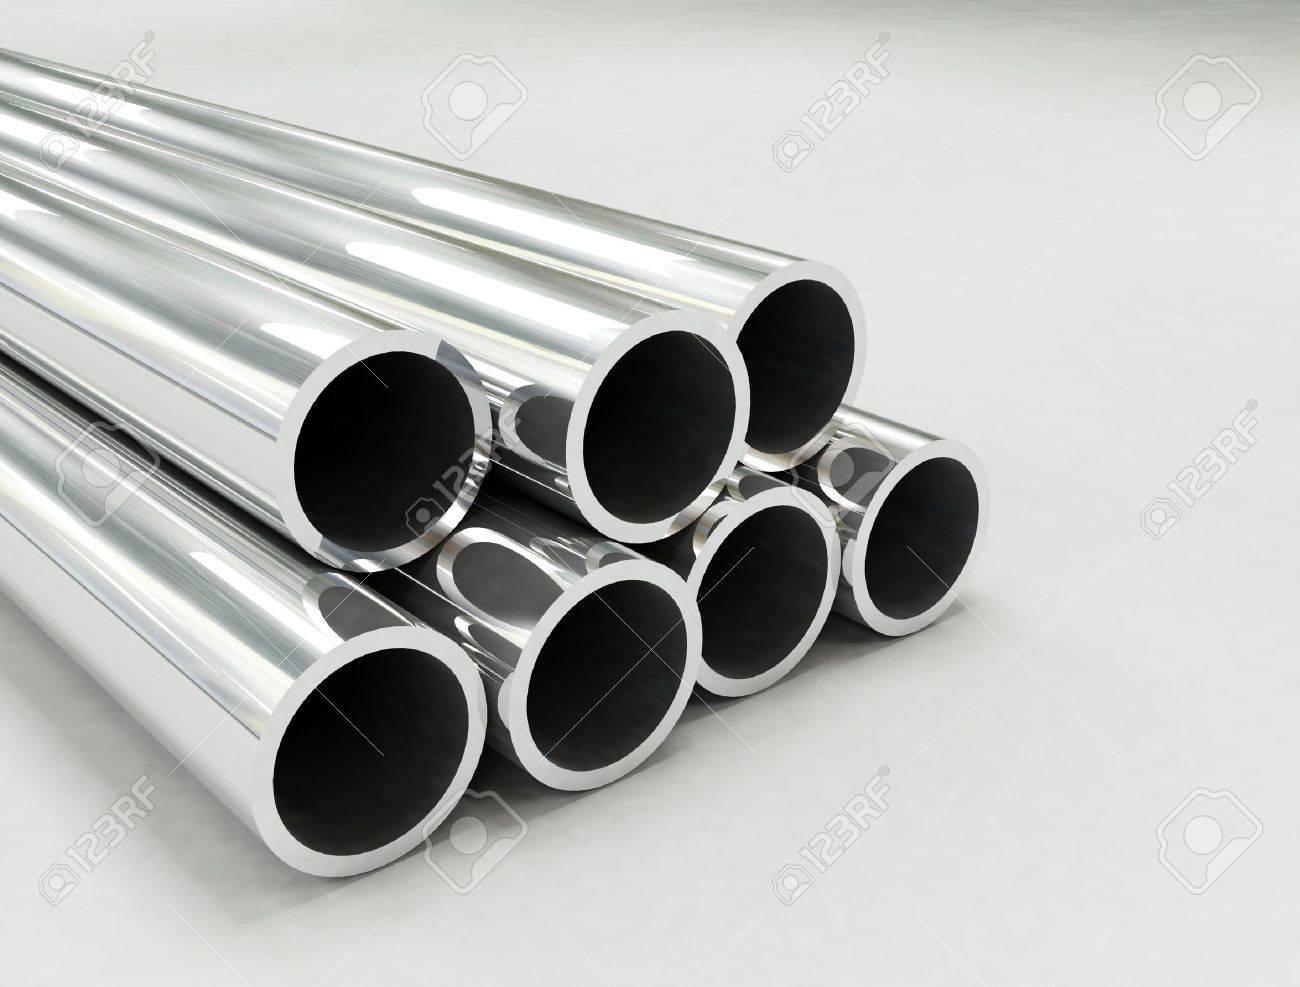 Aluminum tubes Stock Photo - 5679934